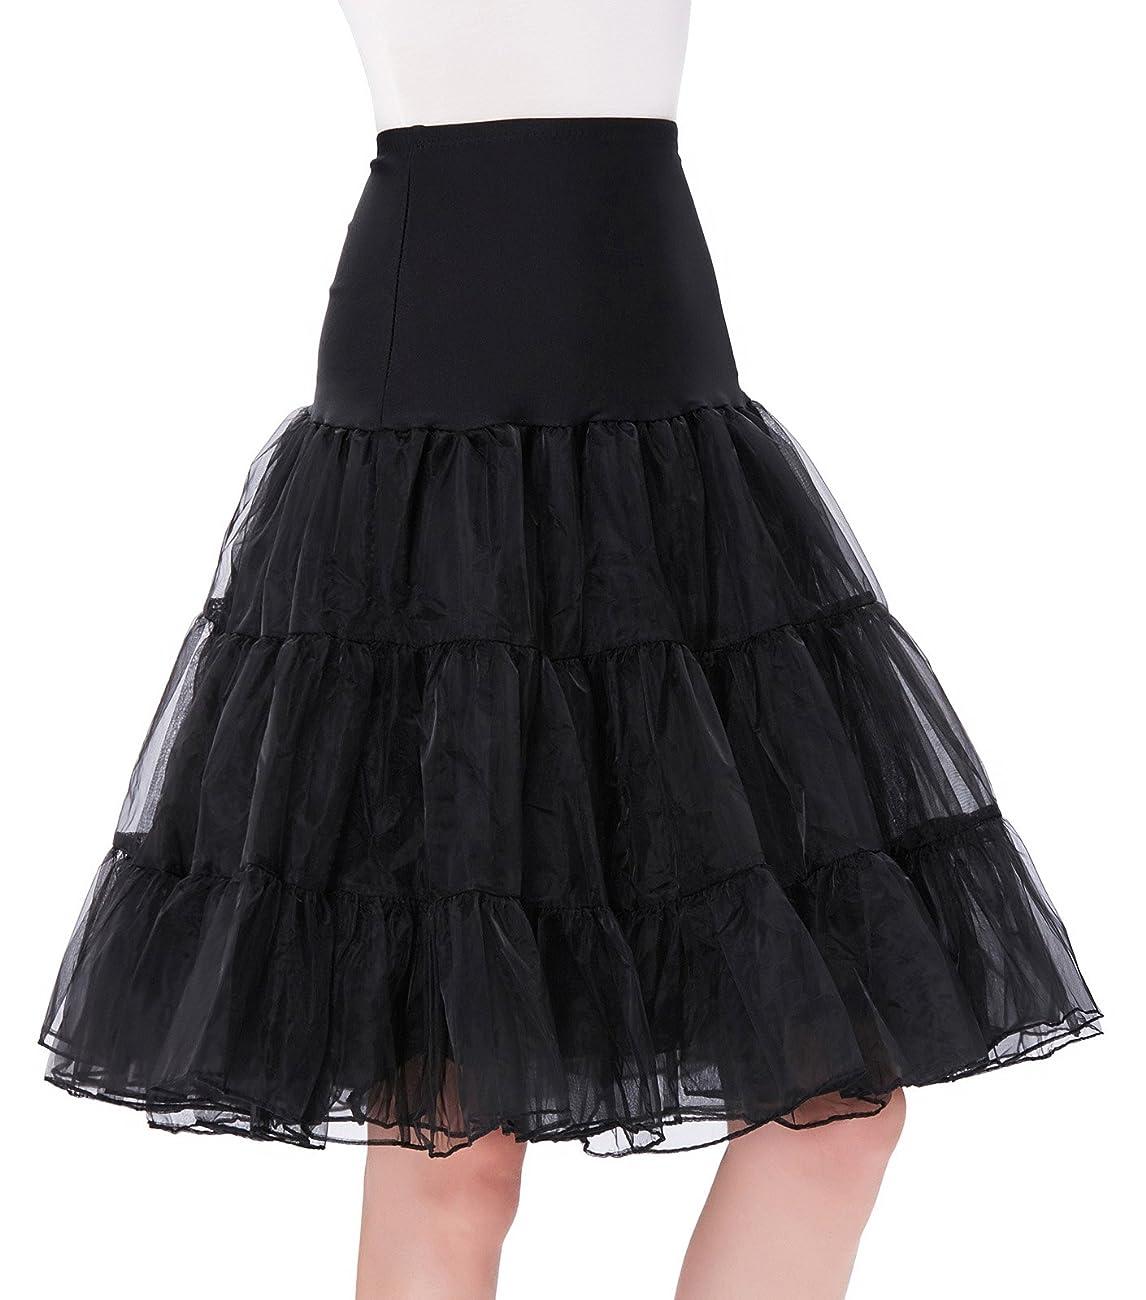 GRACE KARIN®Women 50s Petticoat Skirts Tutu Crinoline Underskirt CL8922 1